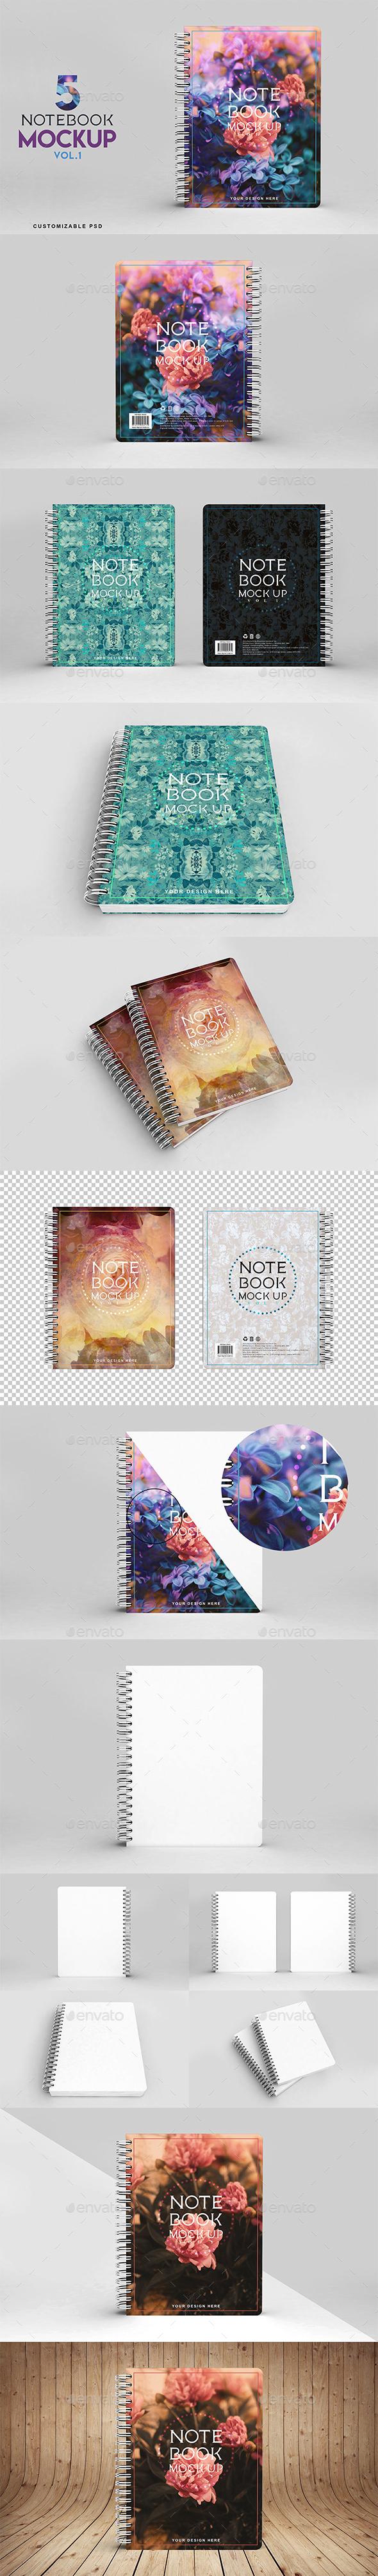 Notebook Mockup Vol 1 - Print Product Mock-Ups